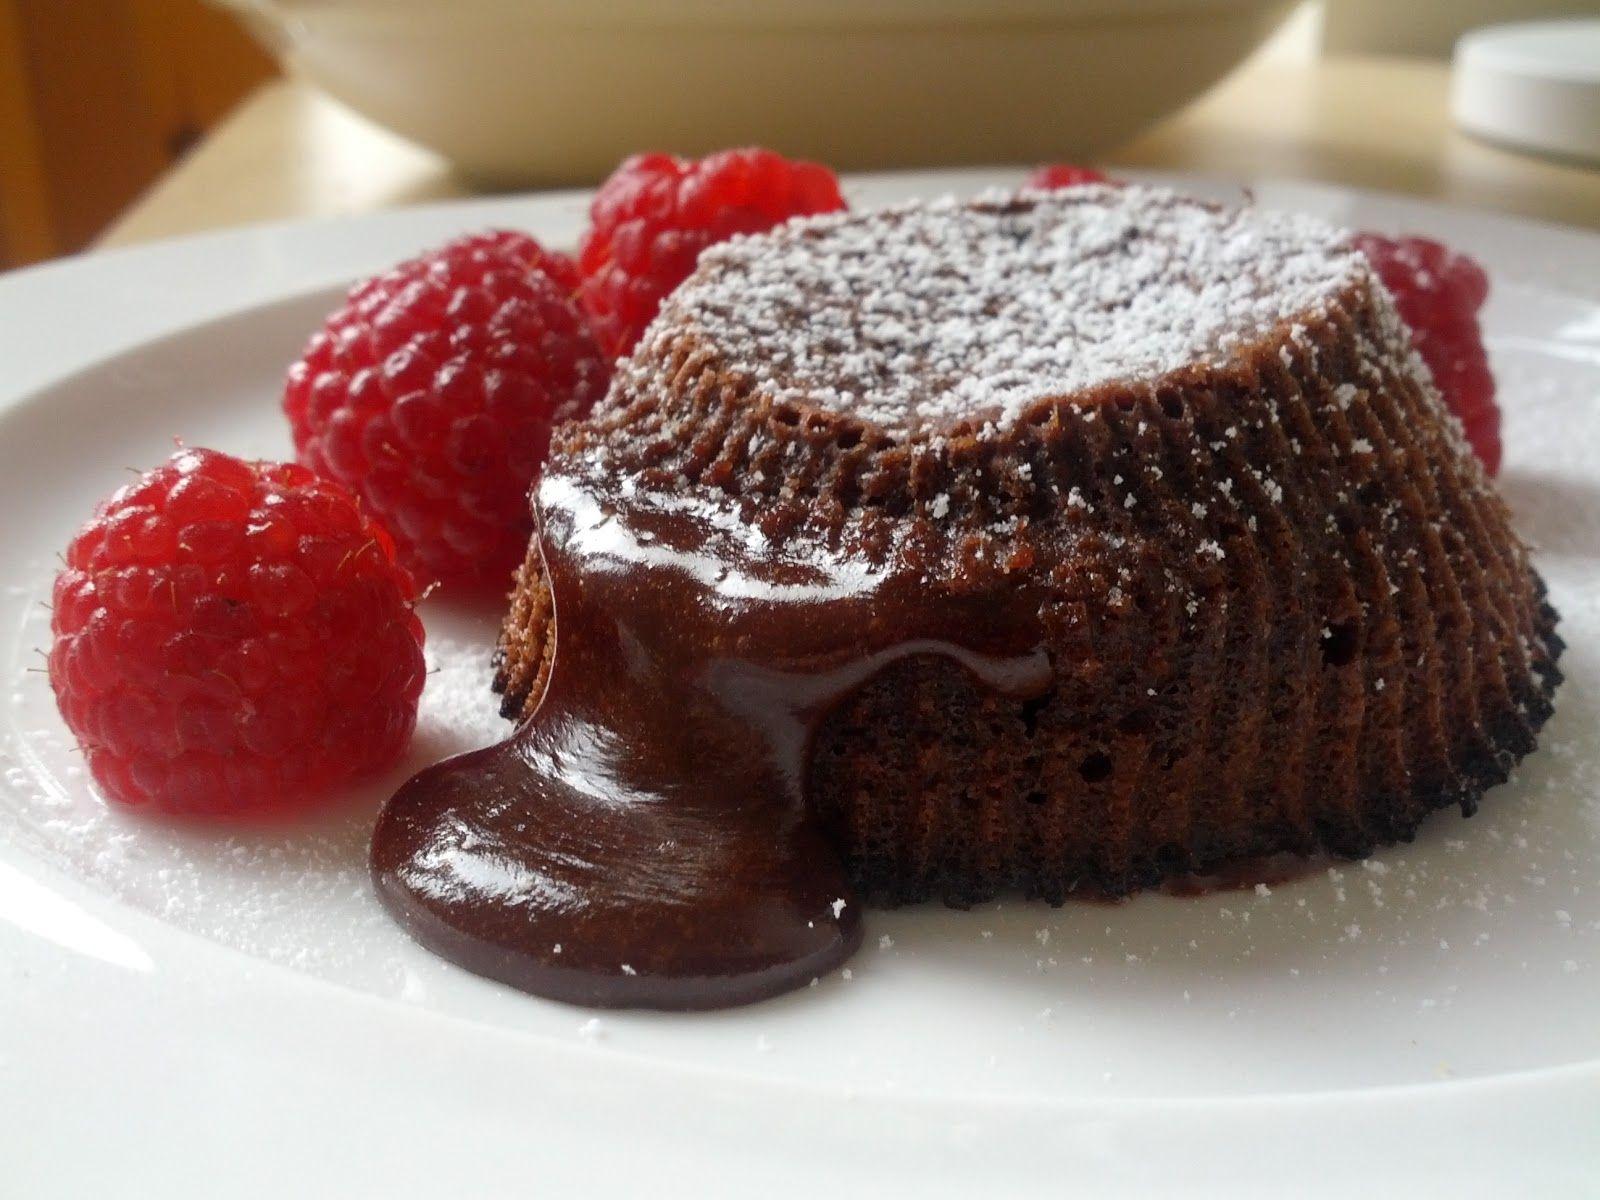 chocolate desserts yummy quick dessert chocolate. Black Bedroom Furniture Sets. Home Design Ideas